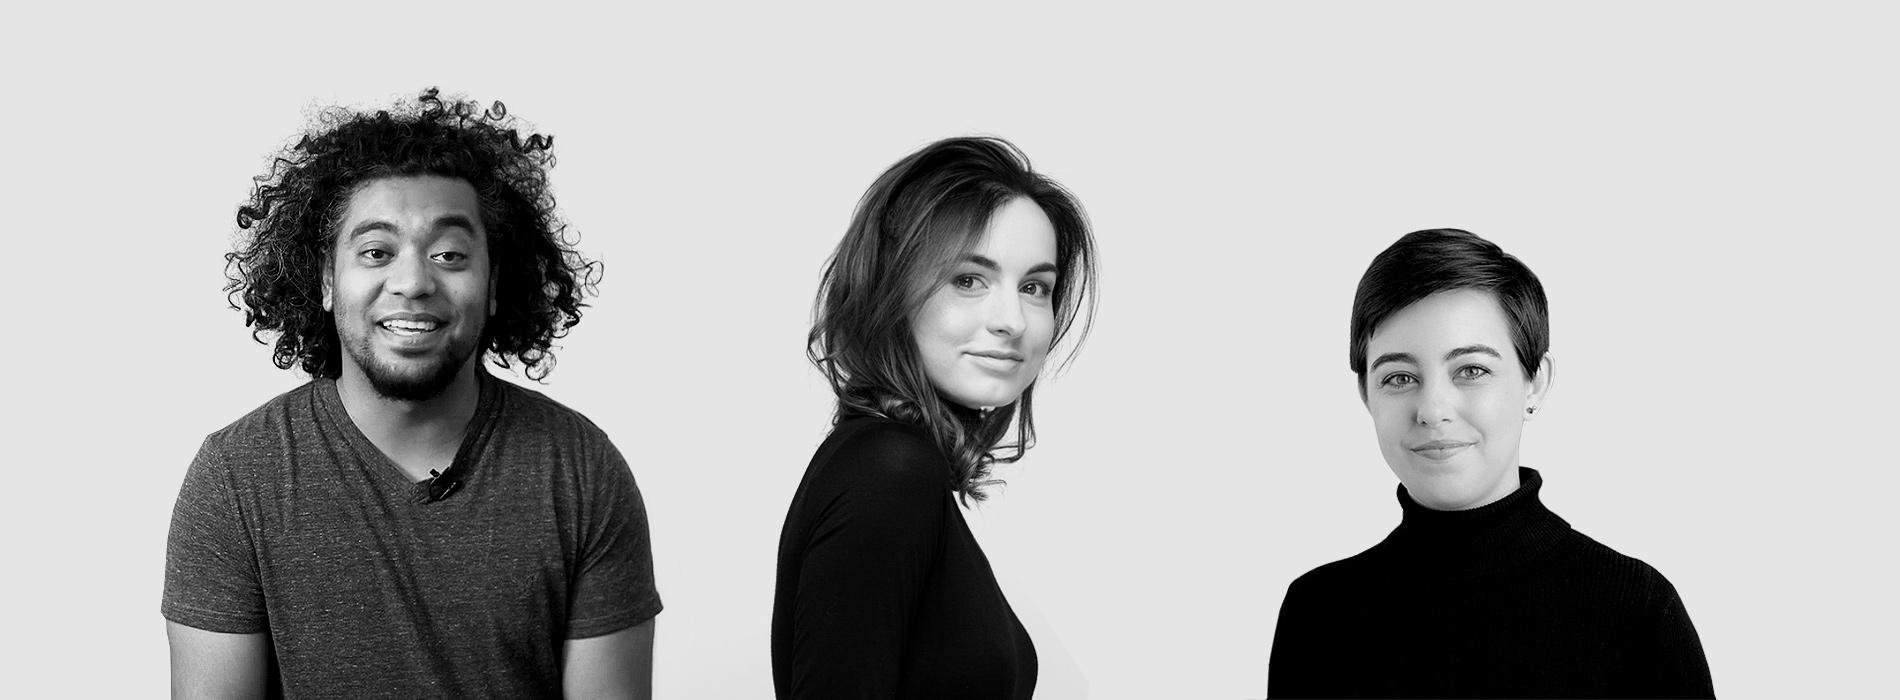 Join the Awwwards Jury 2020 -  Seeking Leading Digital Creatives (Process closed)